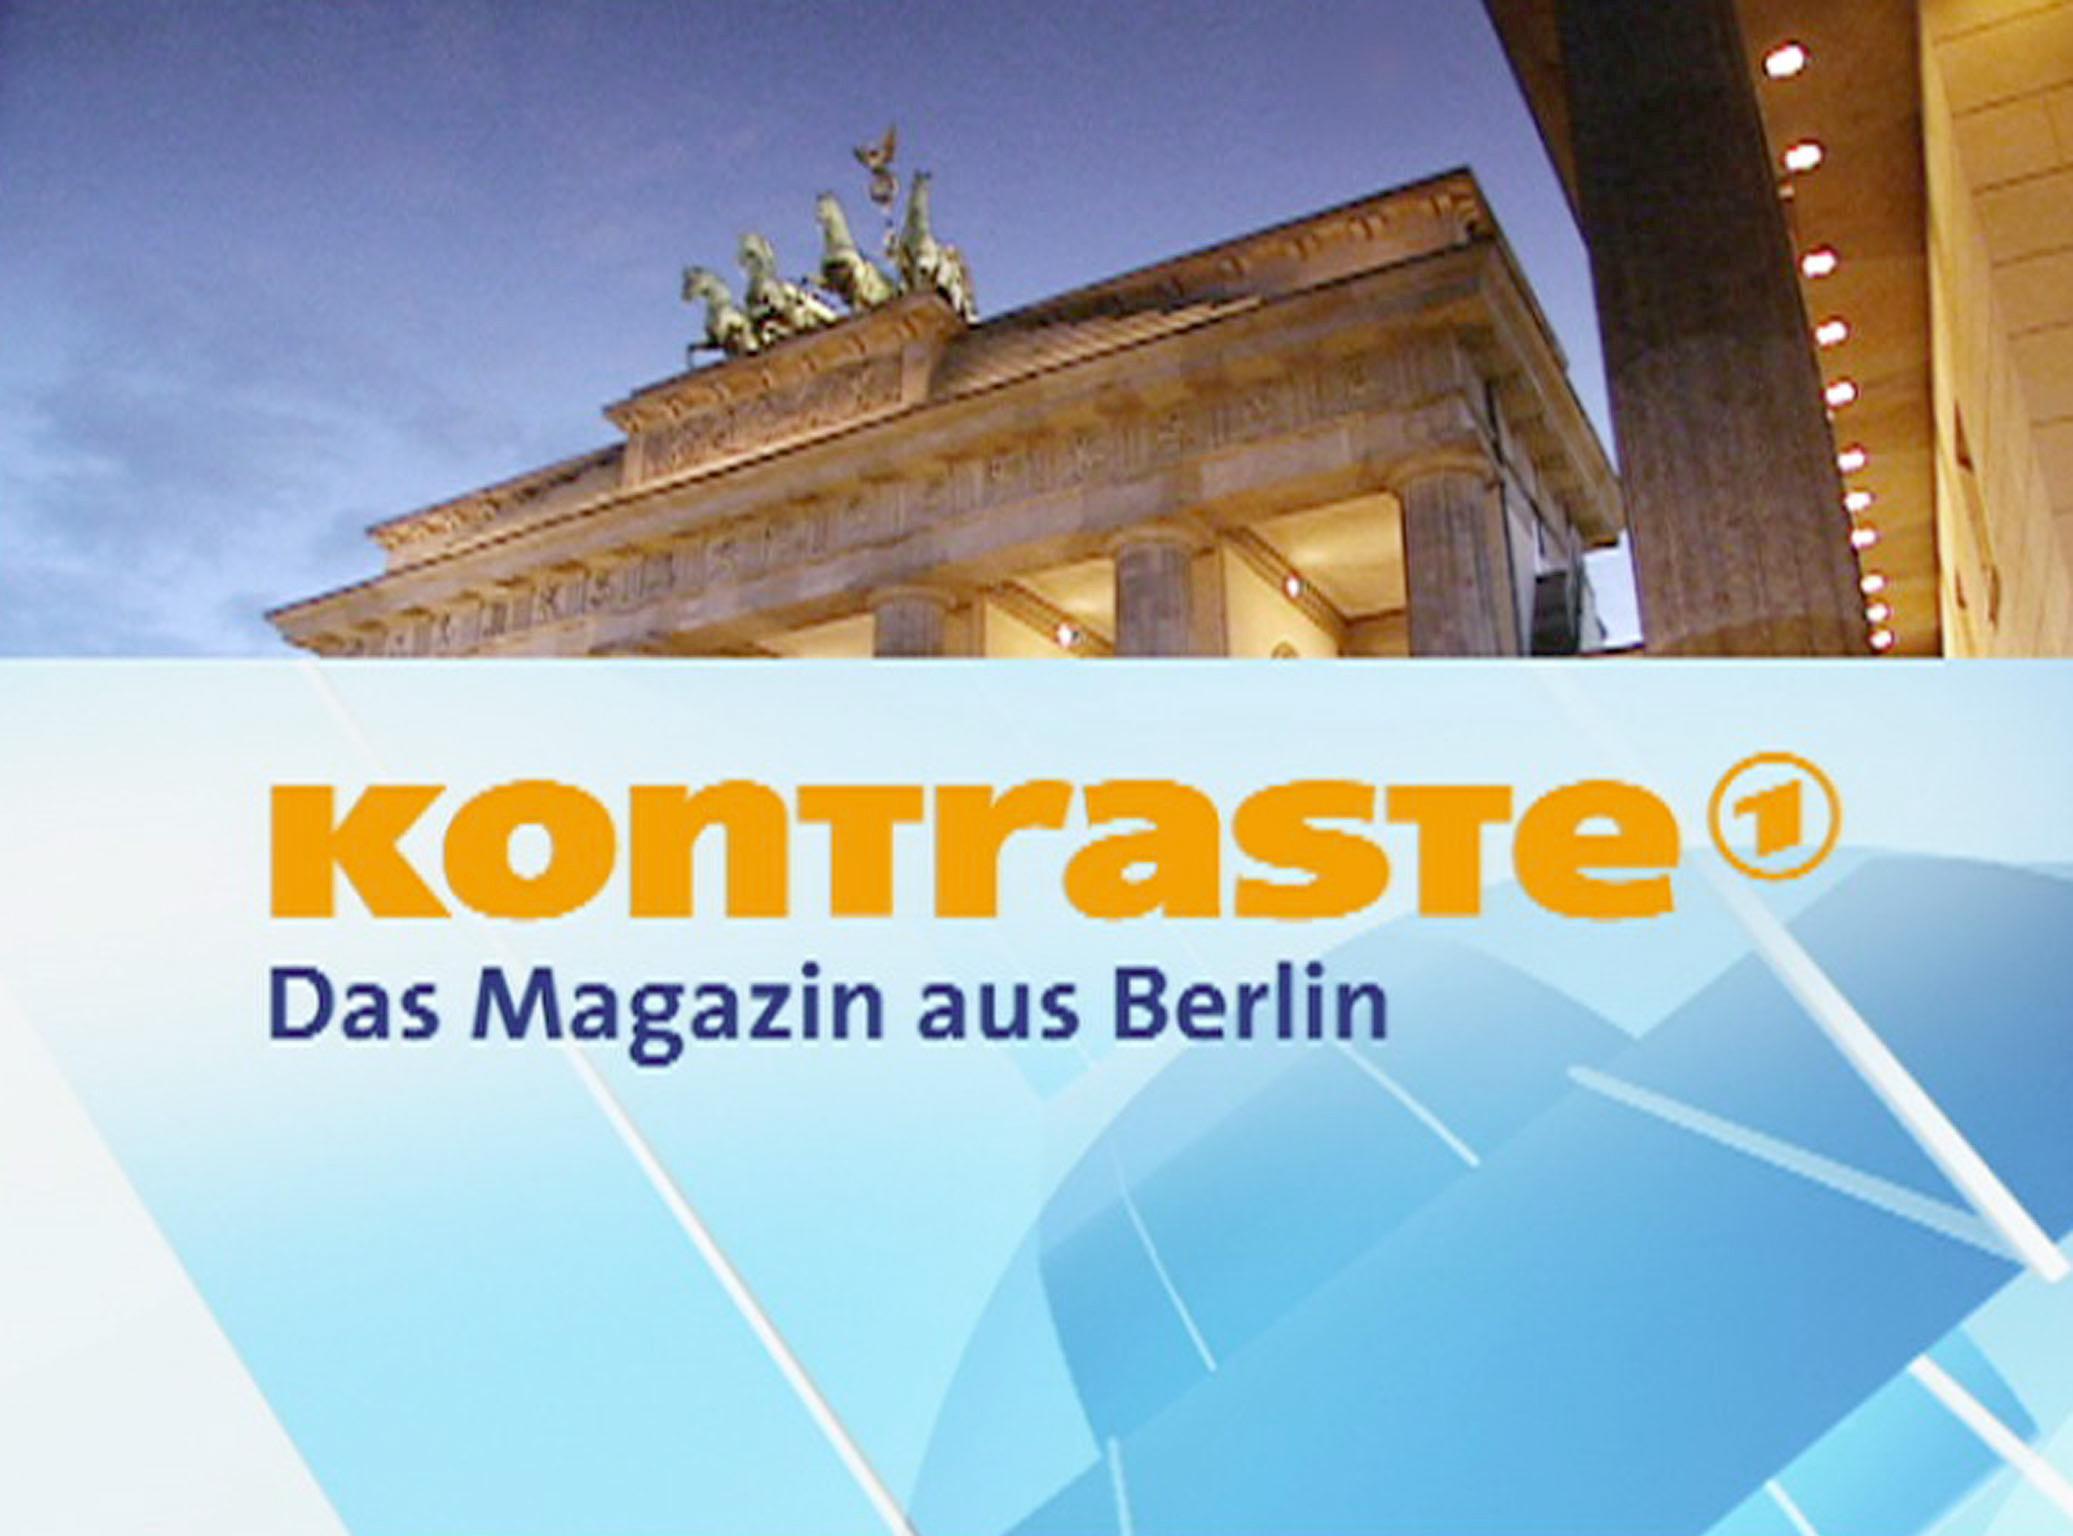 Deutsche-Politik-News.de | ARD Politikmagazin Kontraste